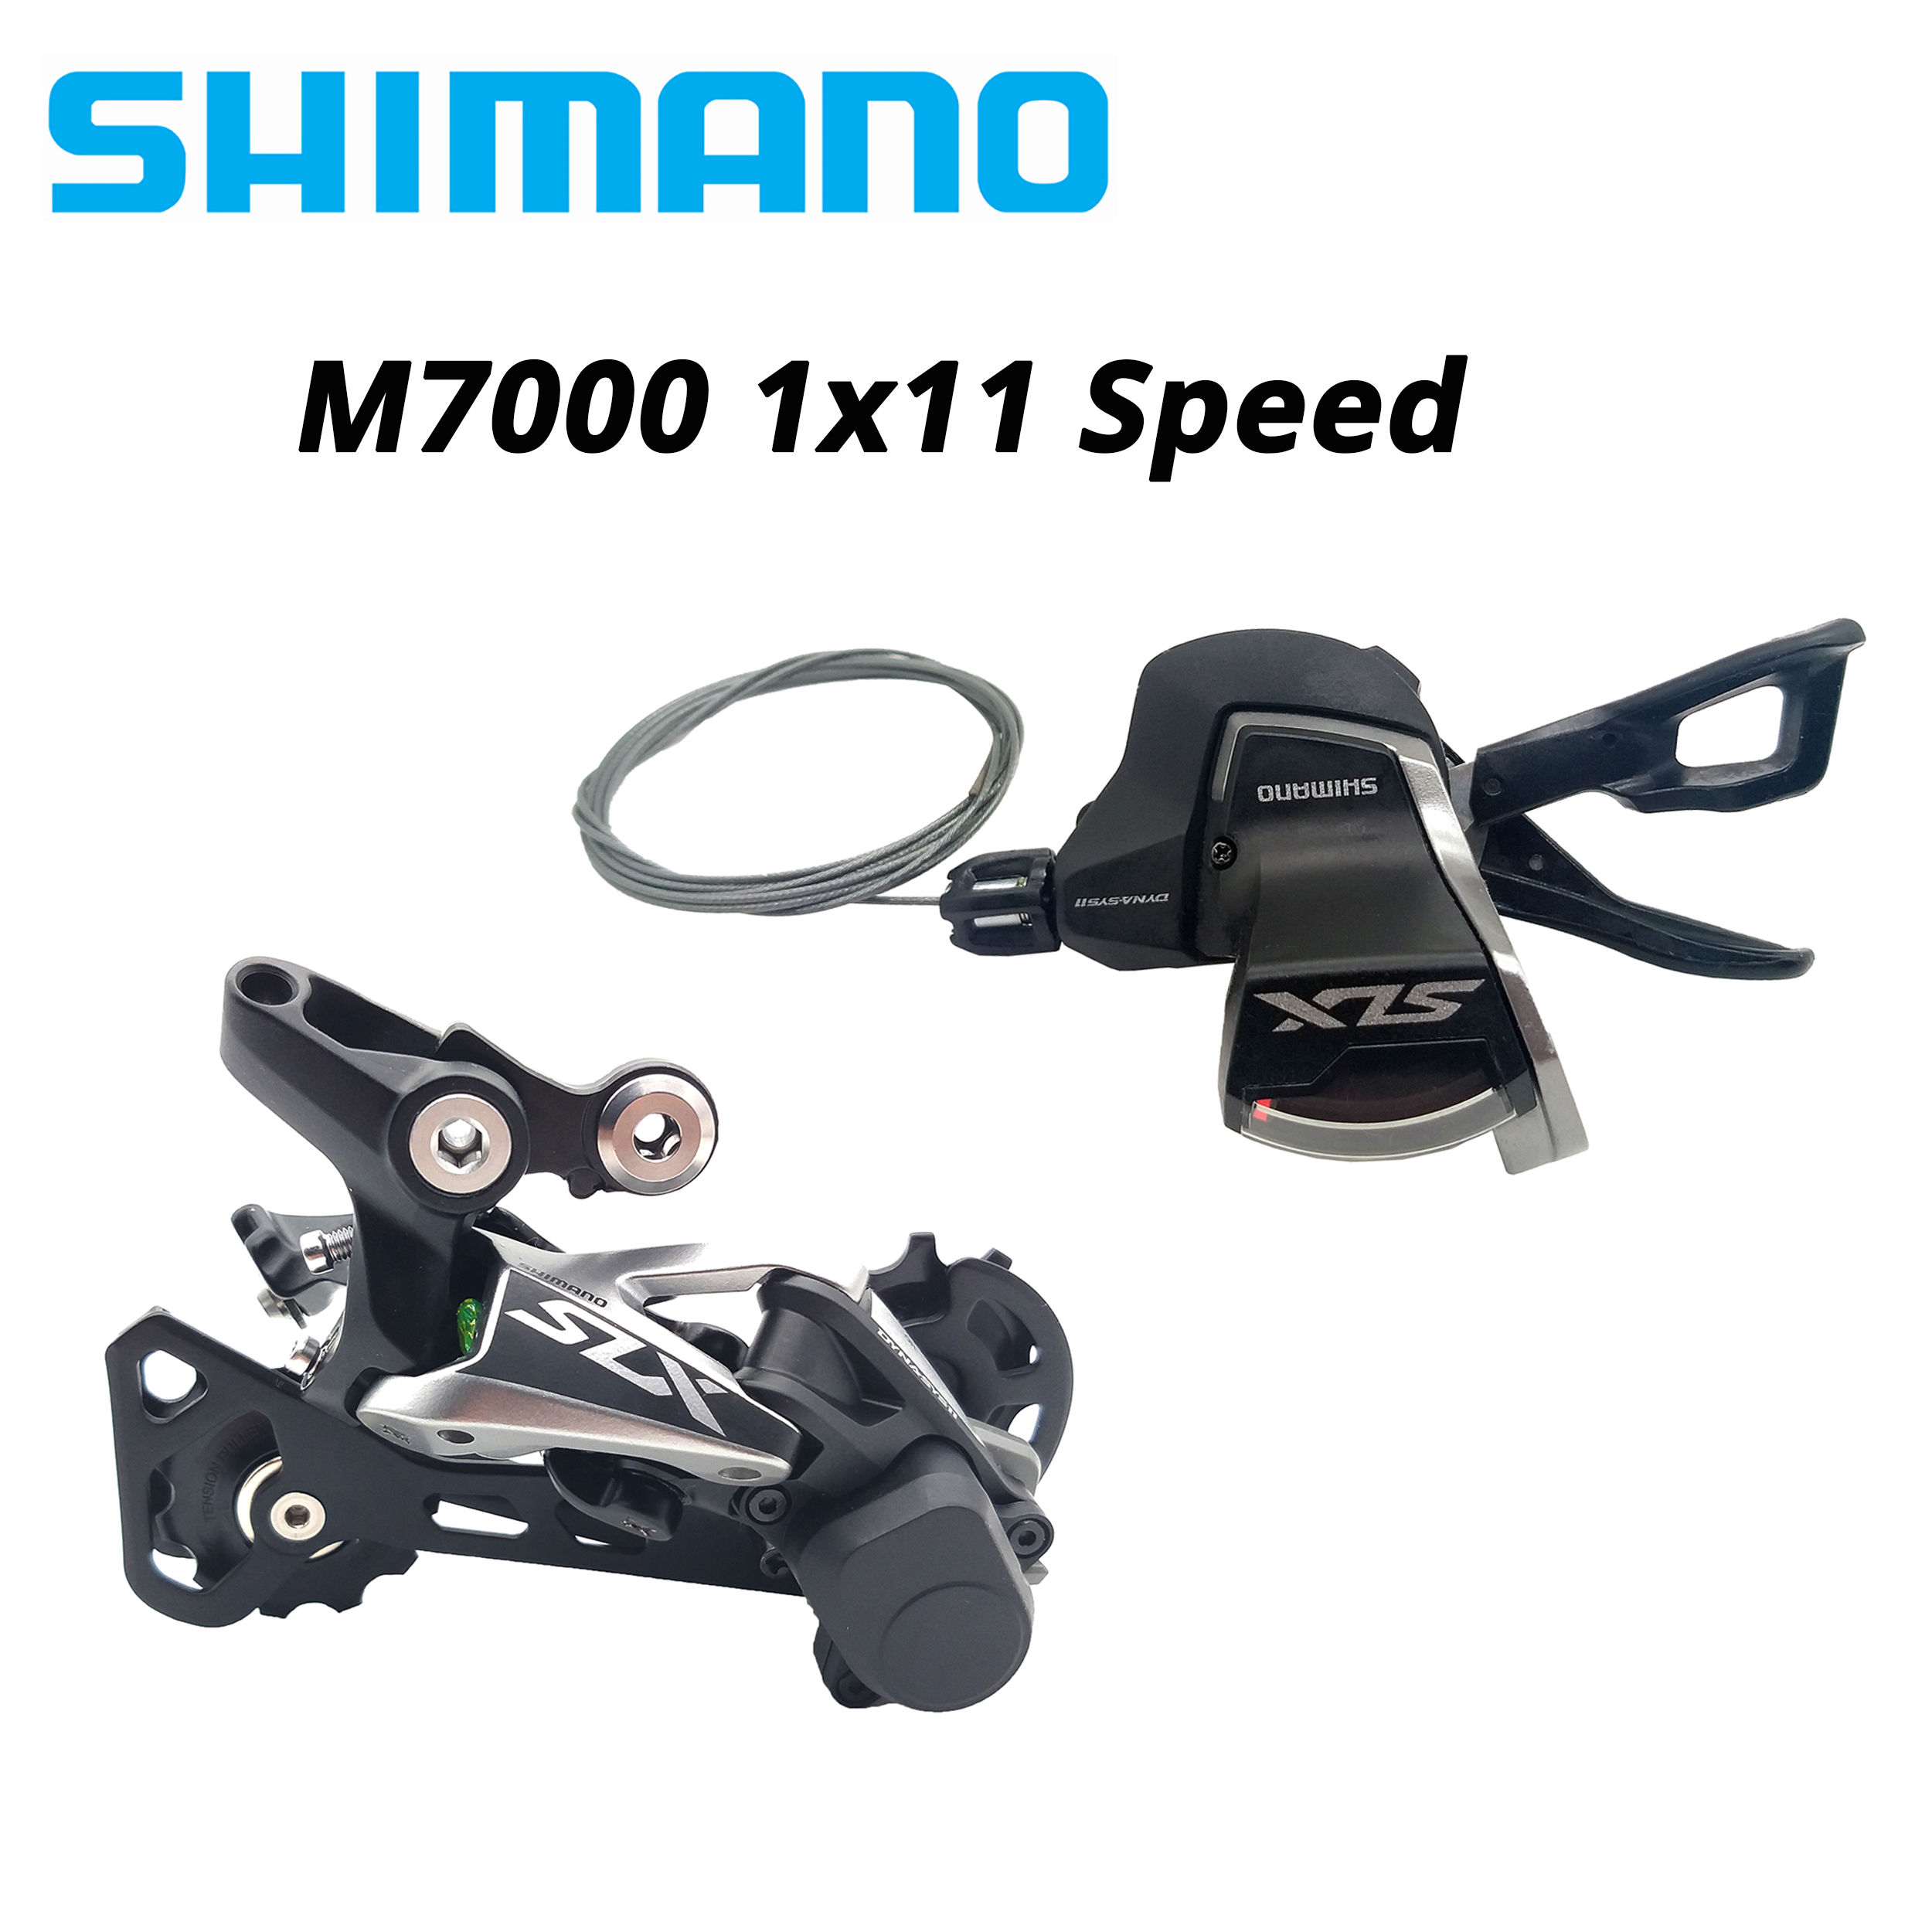 Shimano SLX M7000 11 Speed Trigger Shifter 11 Speed Rear Derailleurs Group